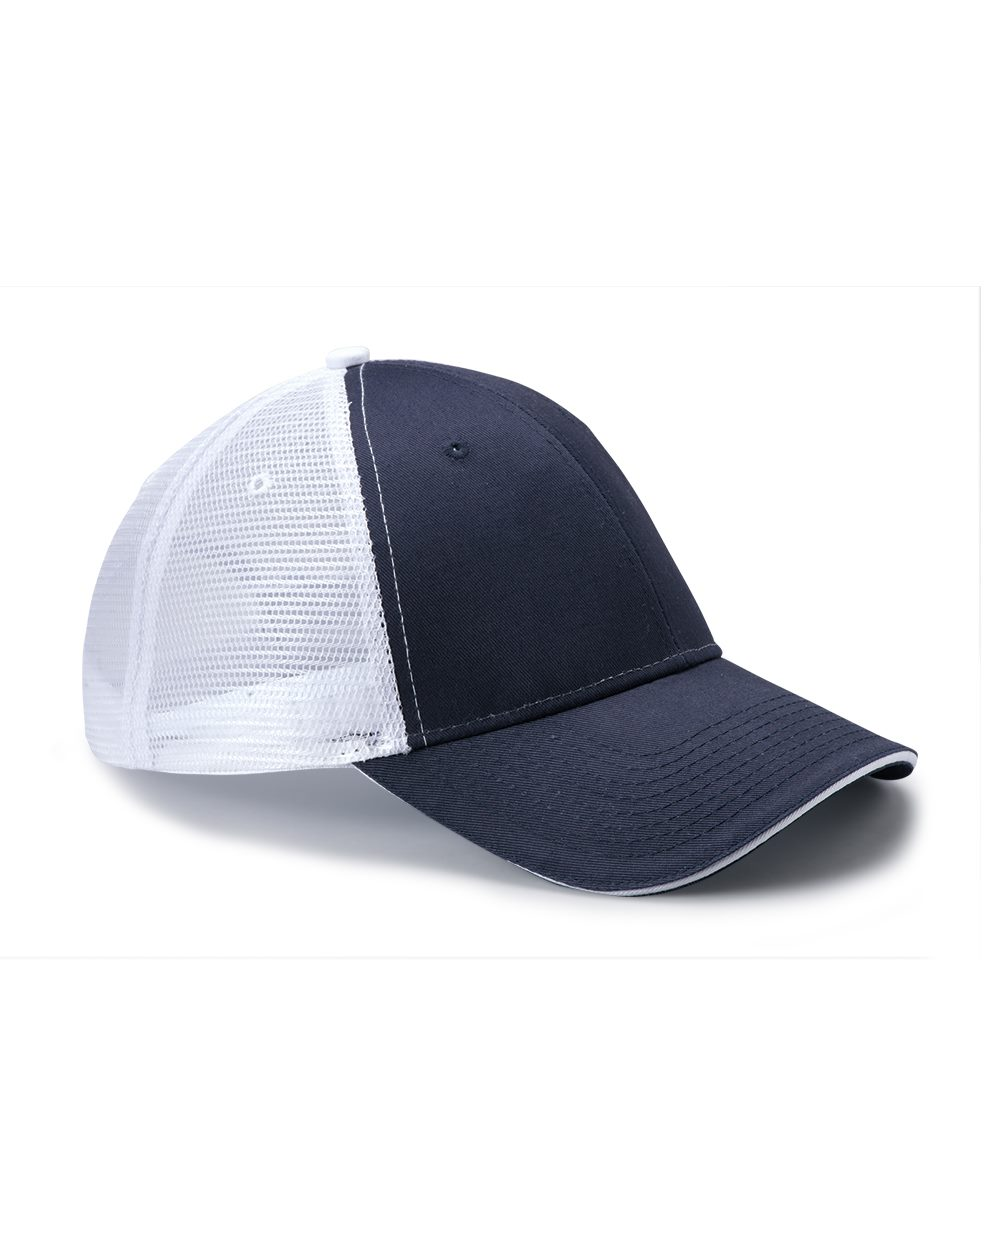 Valucap S102 三明治卡车帽货车帽